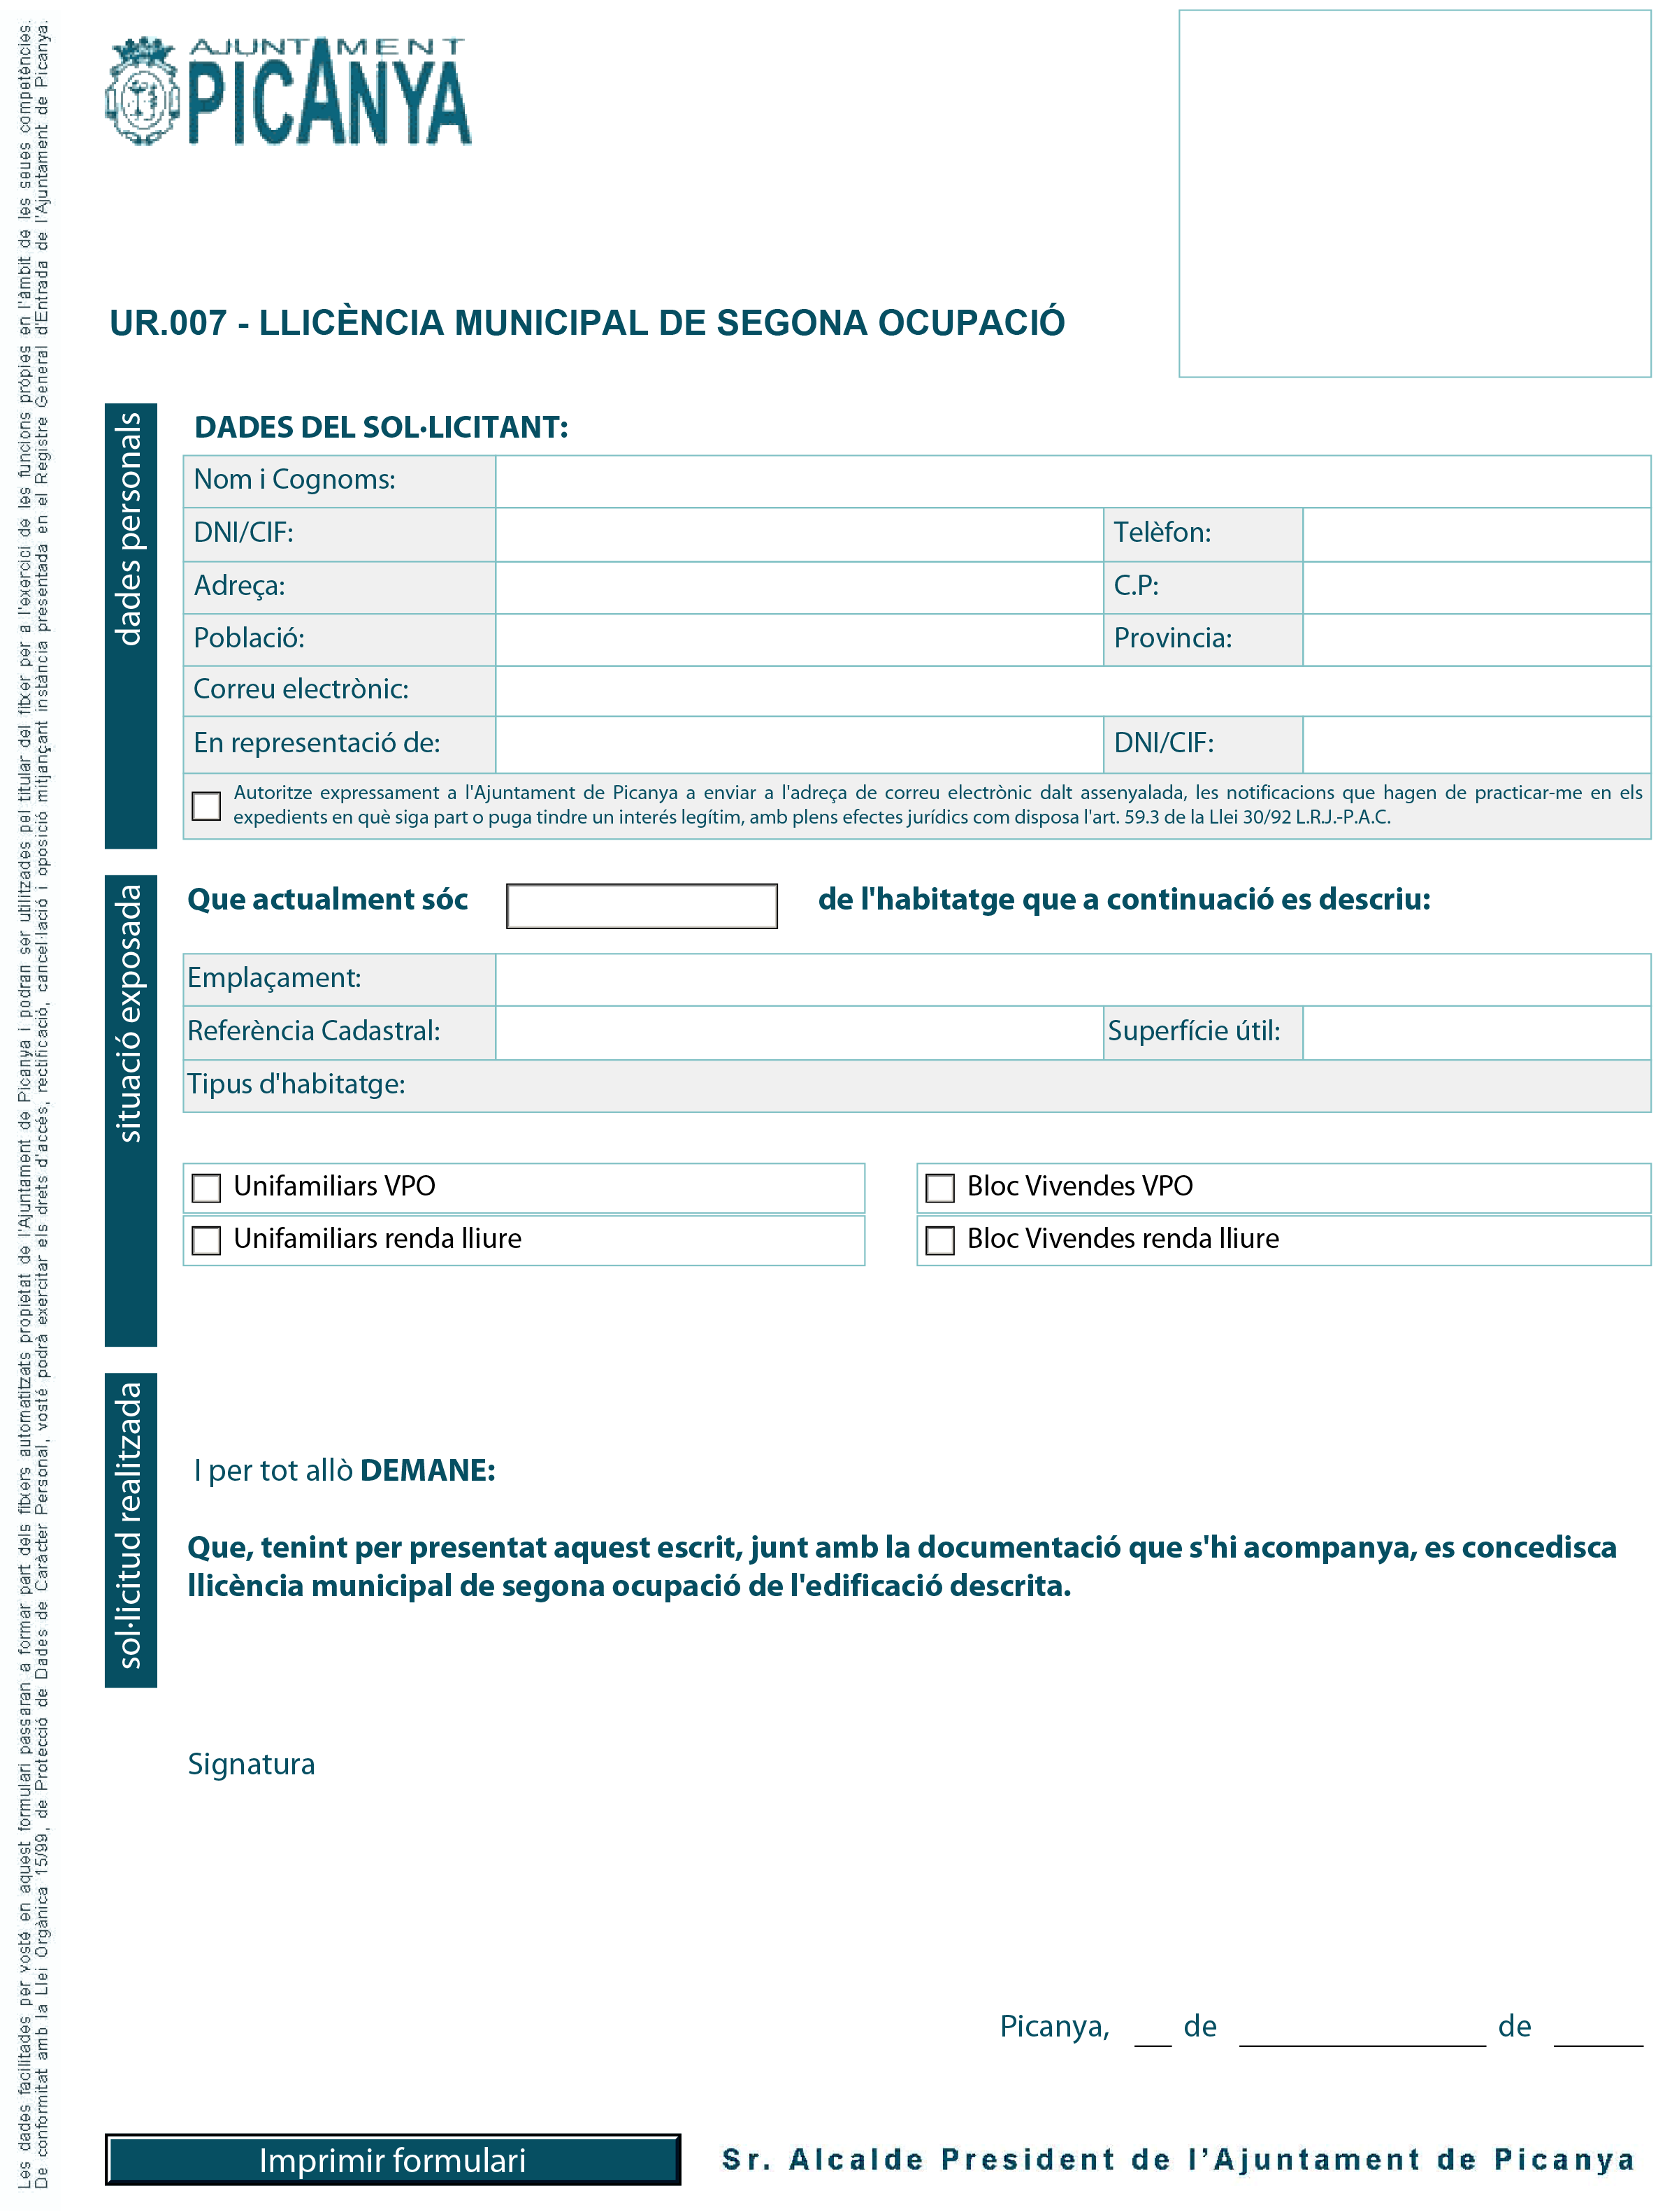 Impreso Declaración Responsable Segunda Ocupación - Picanya 2-1